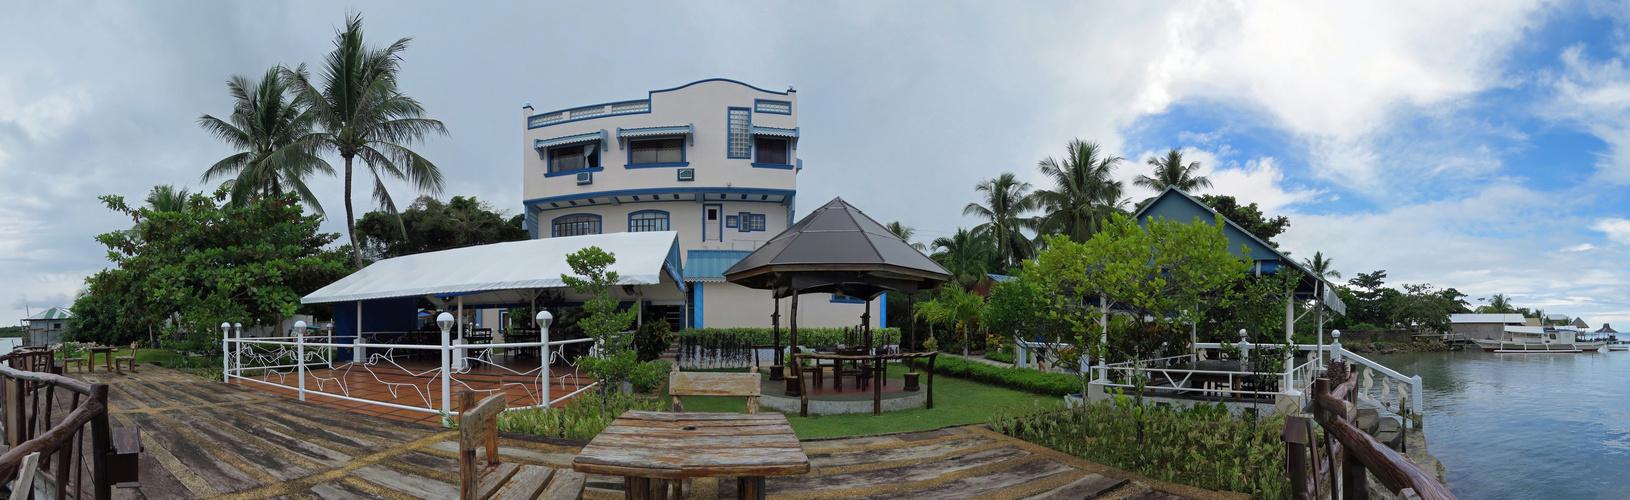 Tanghay View Lodge